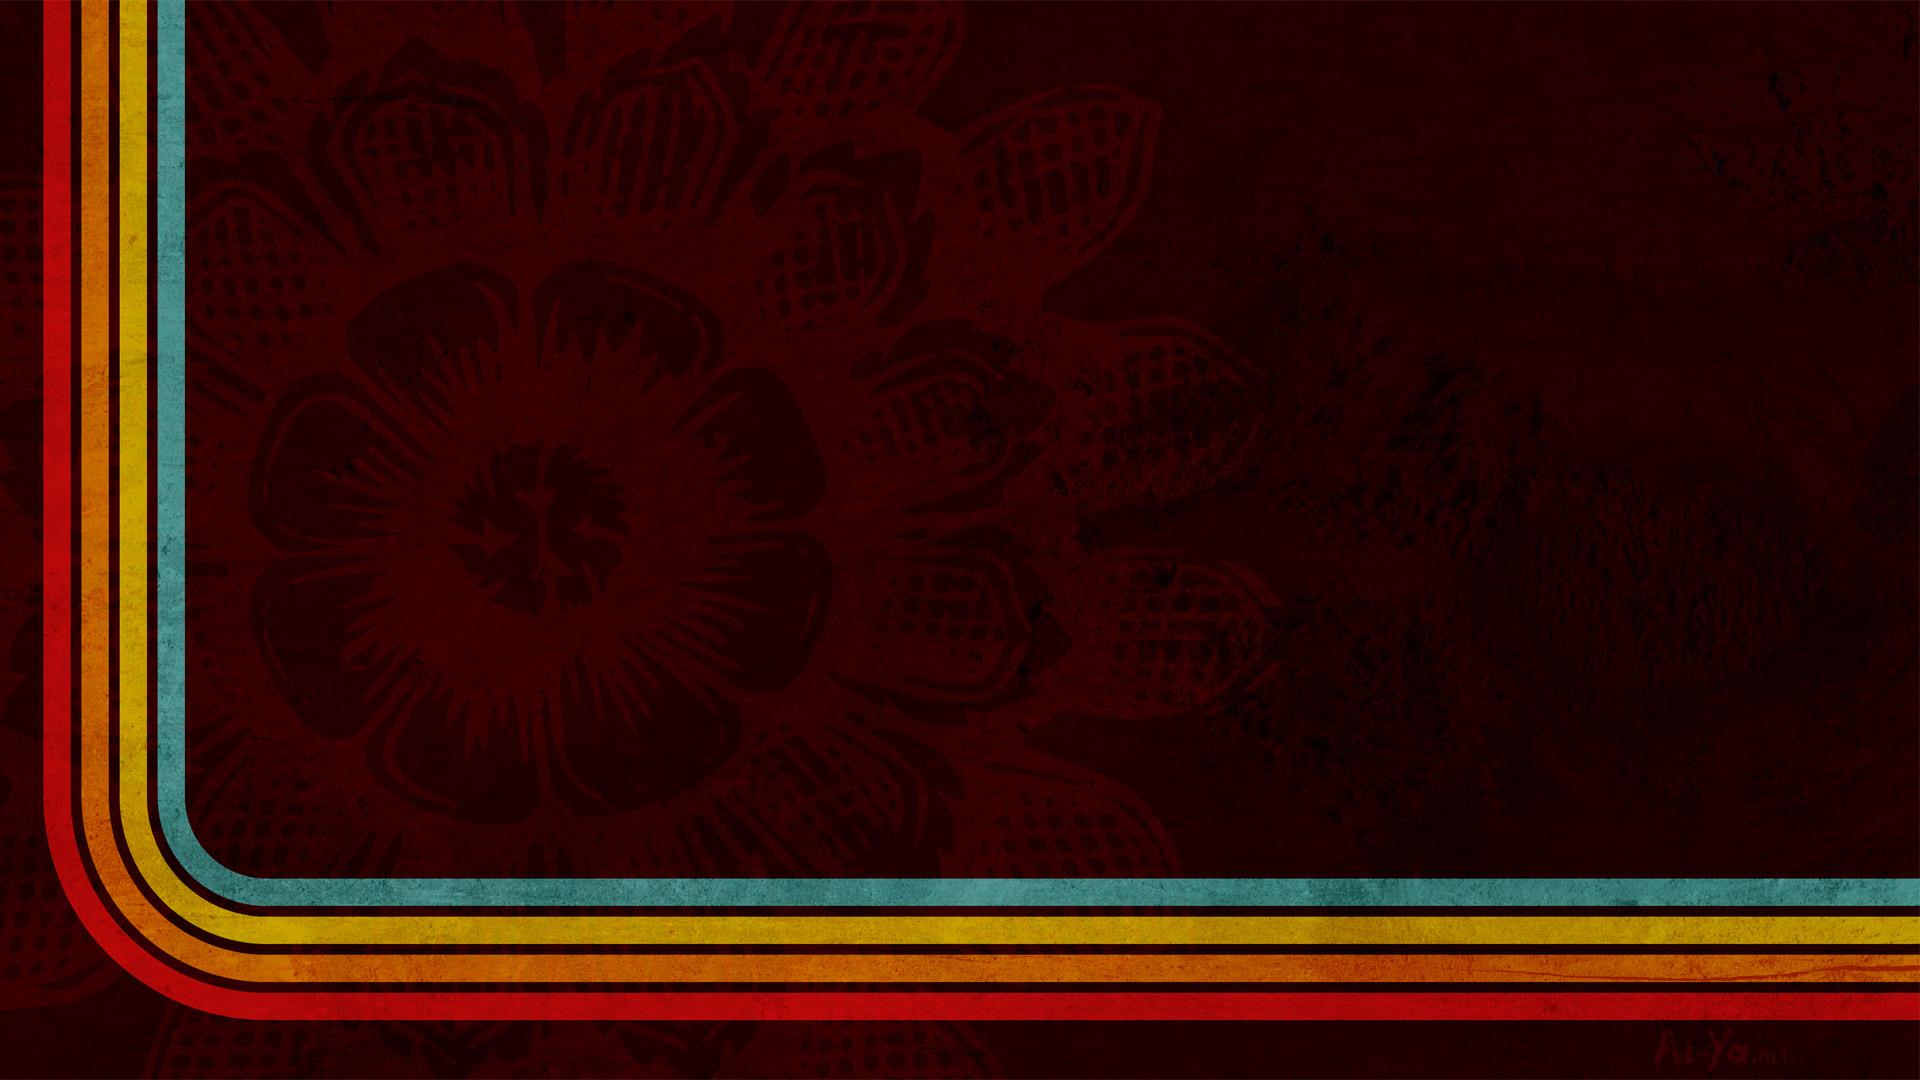 Hd Christmas Wallpapers 1080p Retro Wallpaper 1920x1080 40327